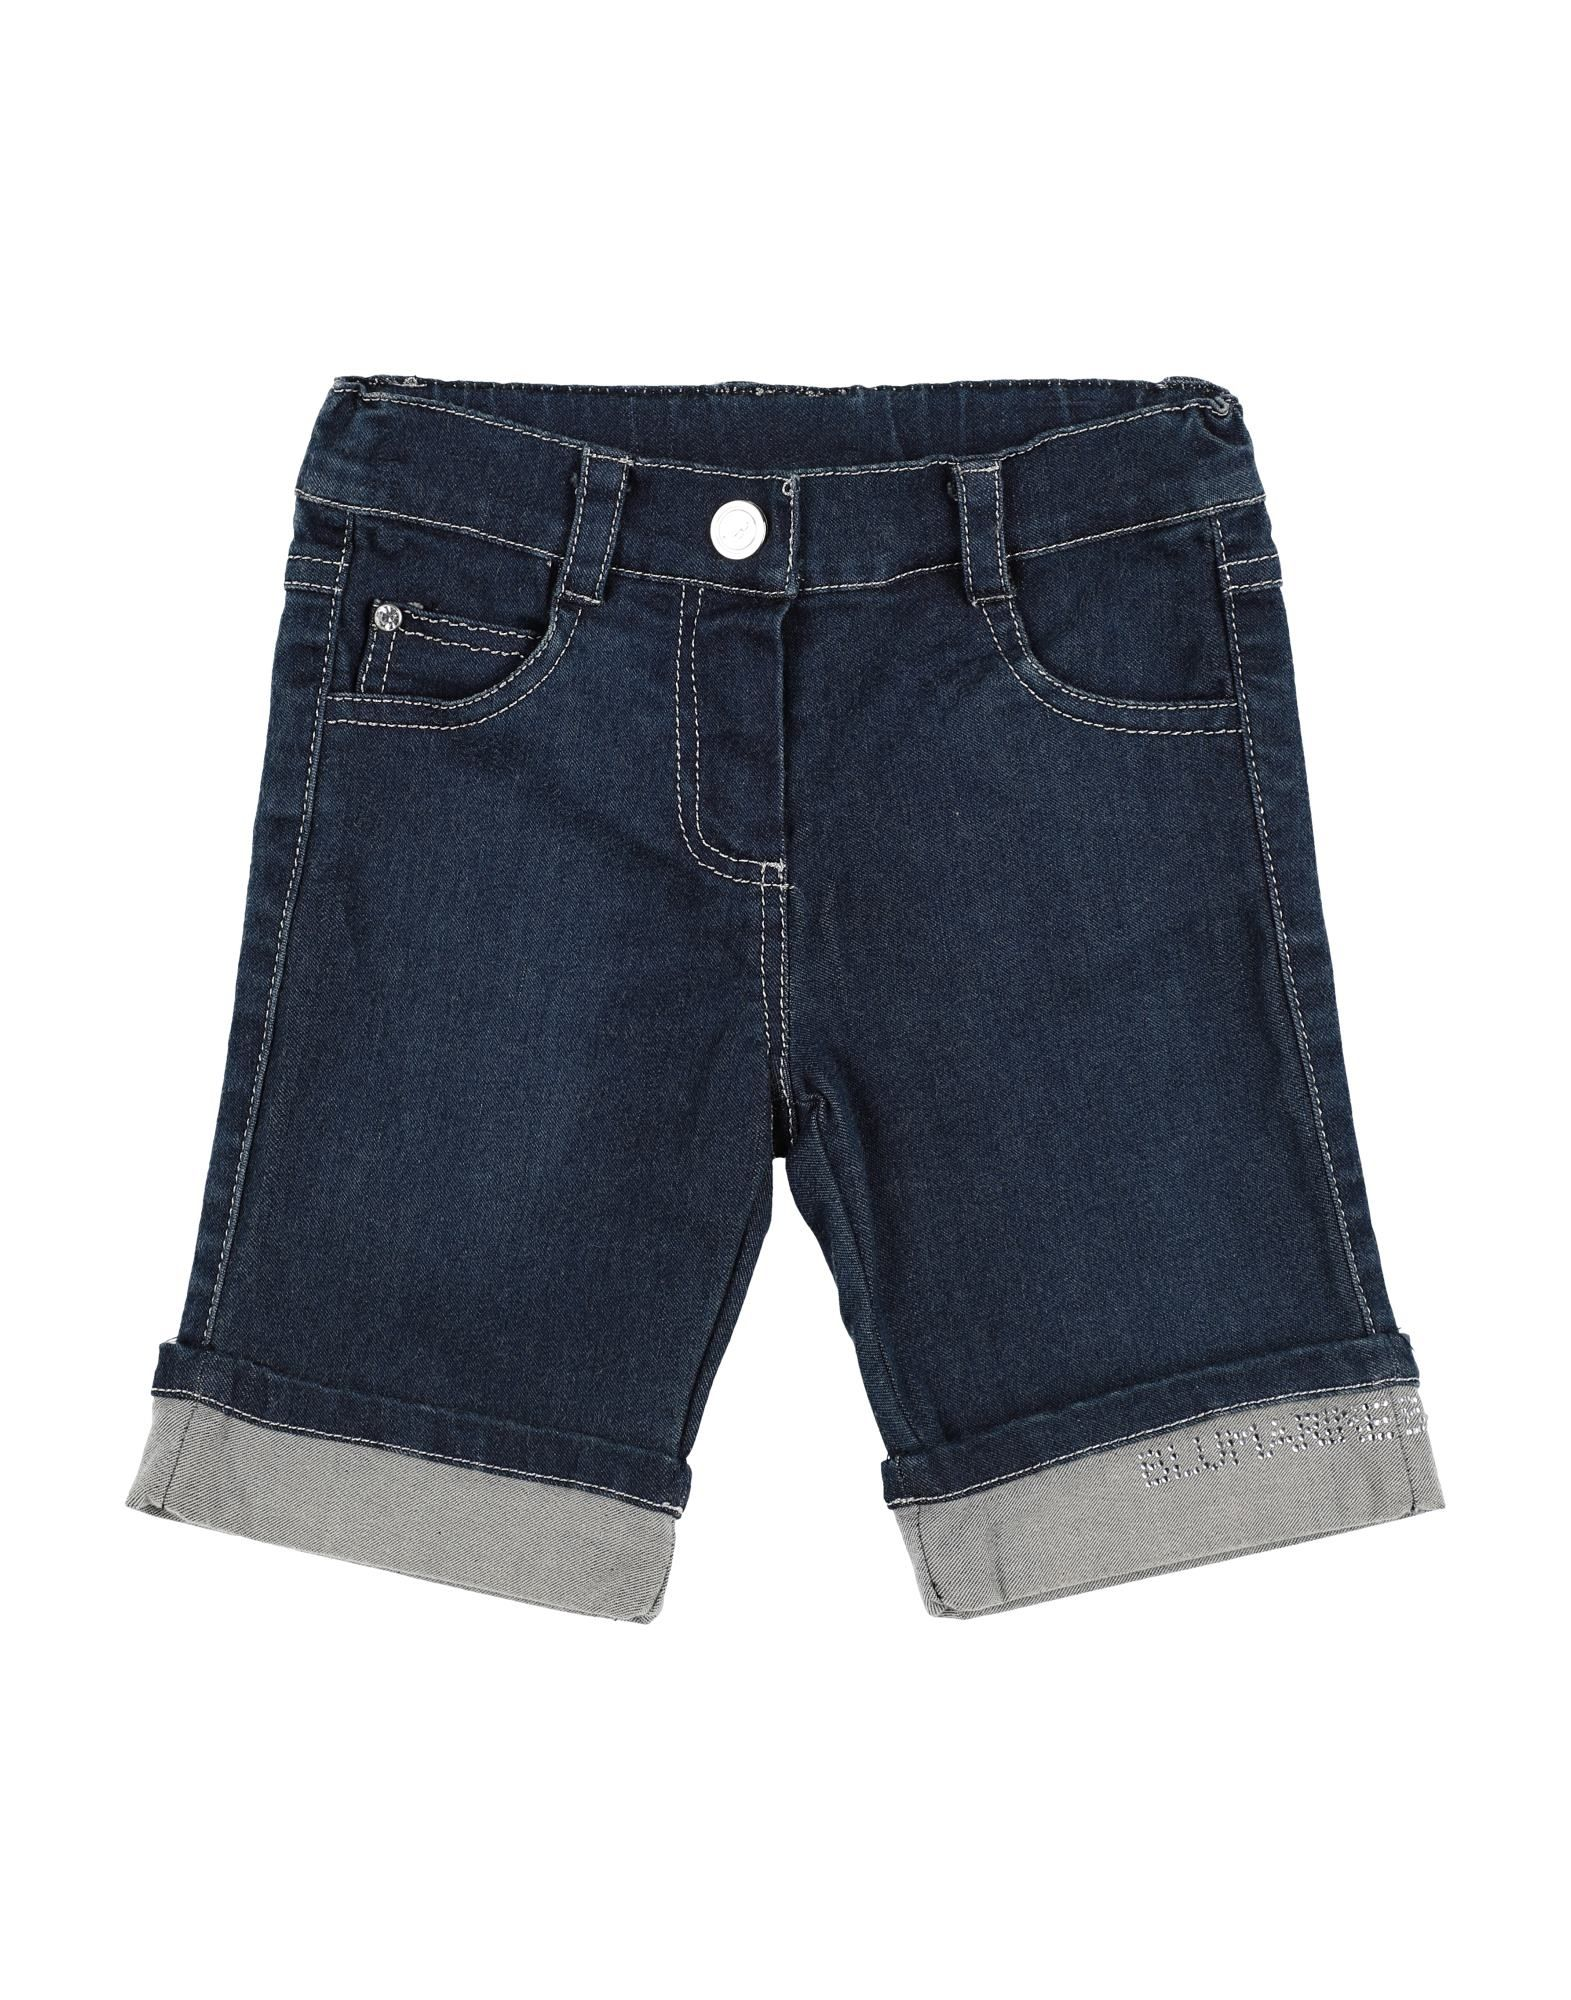 Фото - MISS BLUMARINE Джинсовые брюки miss blumarine бикини